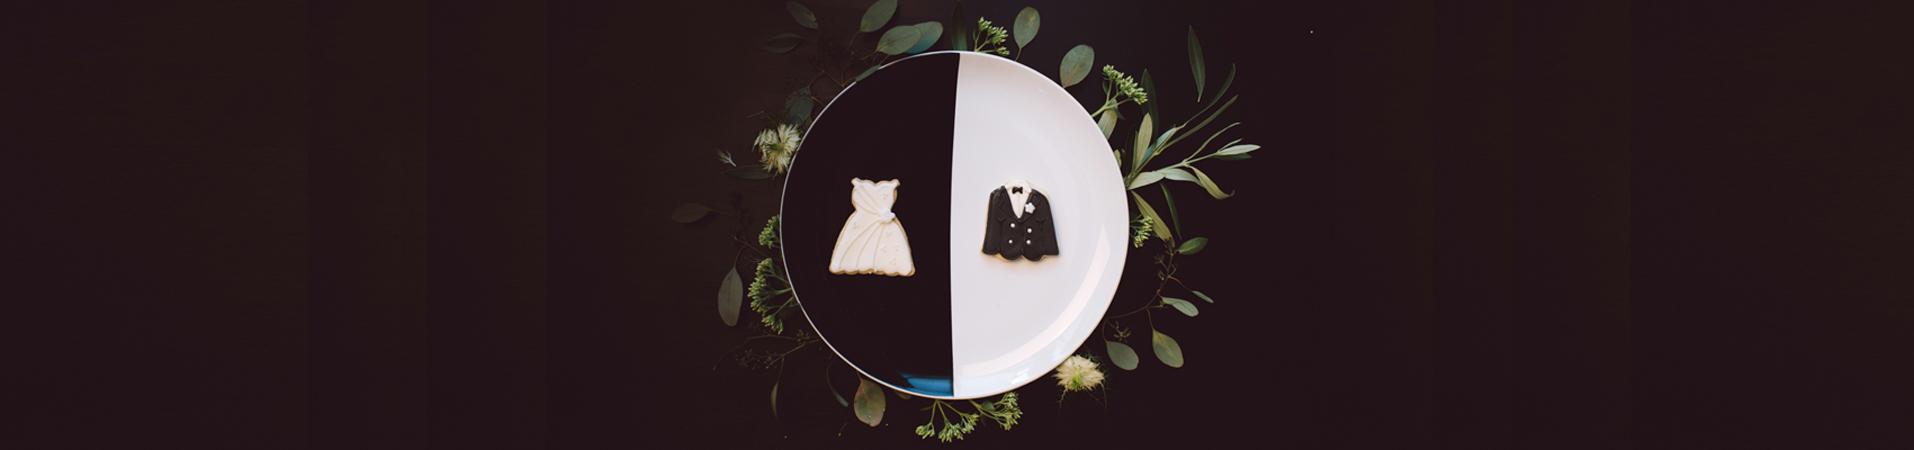 wedding_planner_treviso_padova_venezia-1